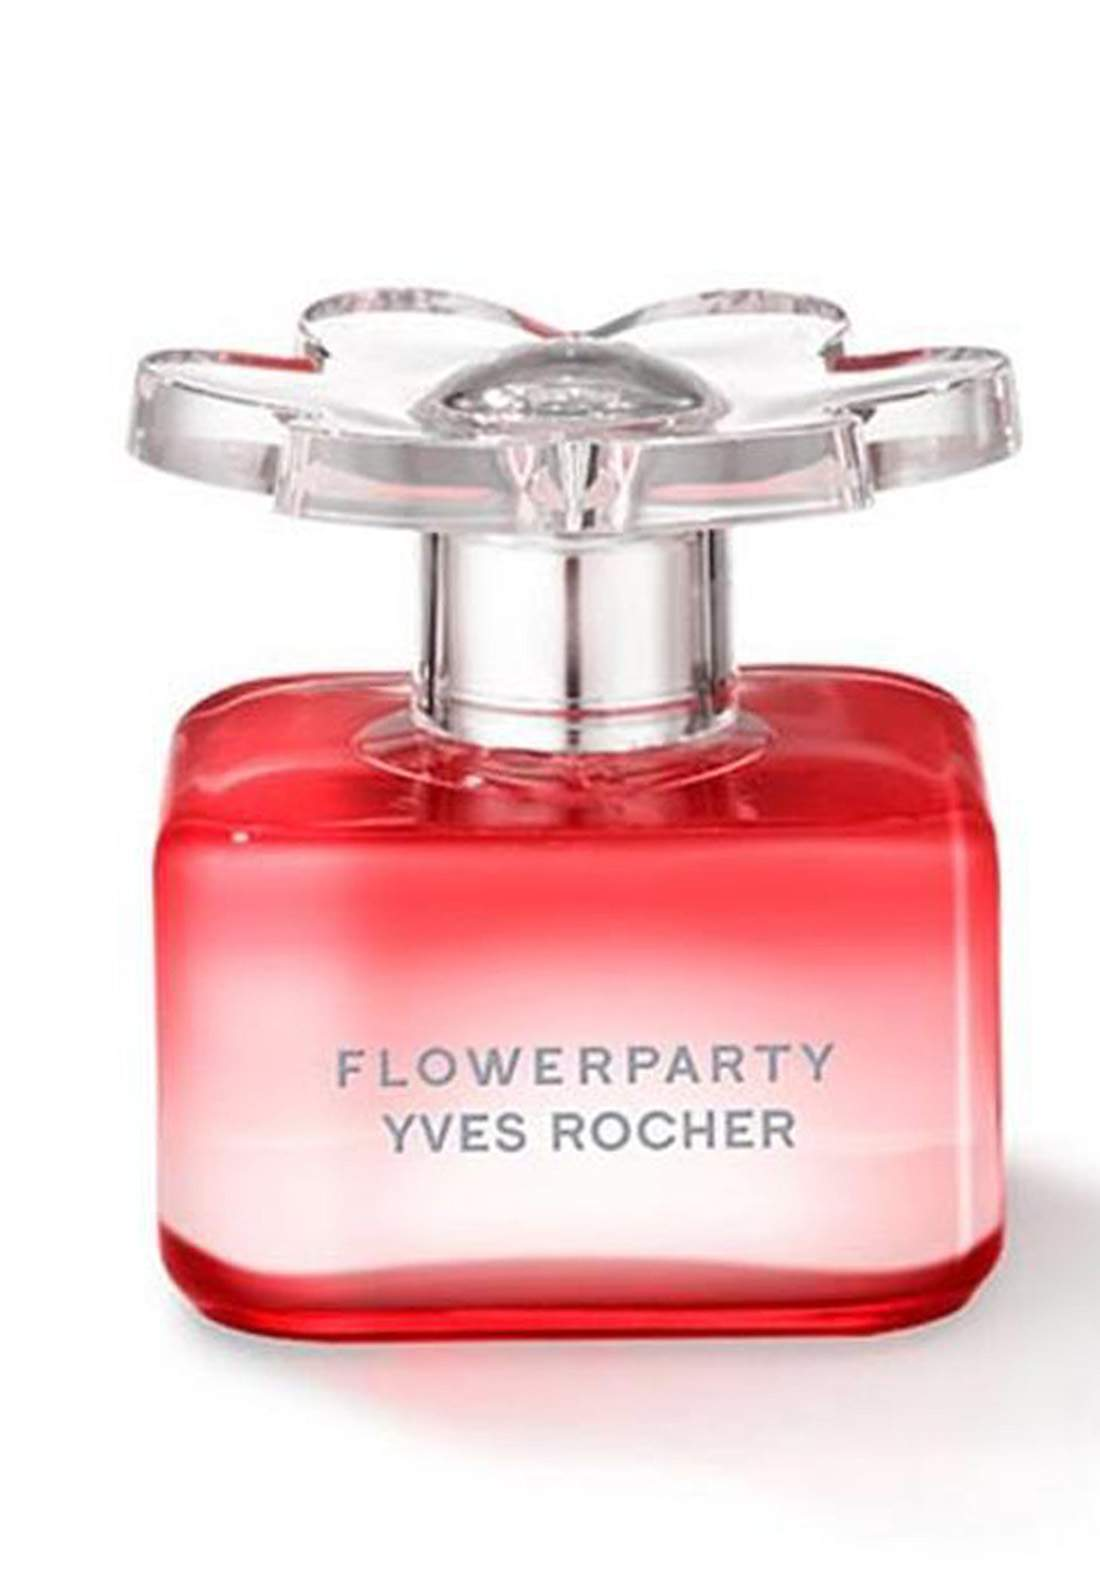 Yves Rocher 21770 Flower Party Perfume Eau de Toilette For Women 50ml   عطر نسائي